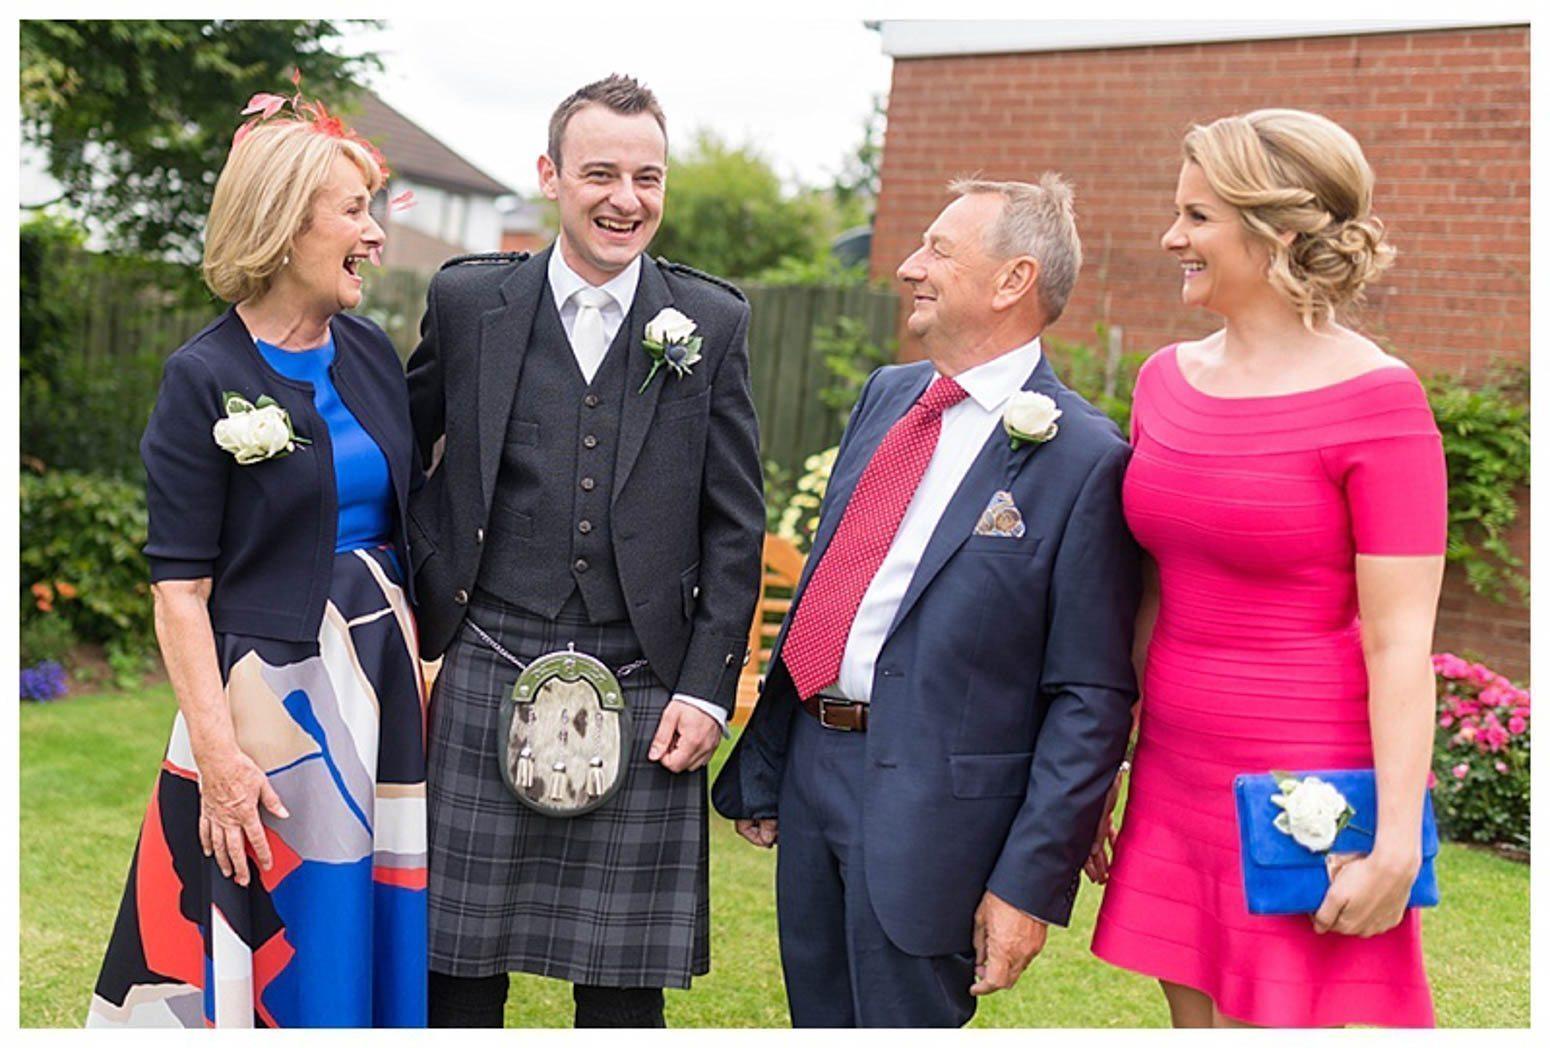 Ballygally Castle Wedding Photographs by Ricky Parker Photography-13